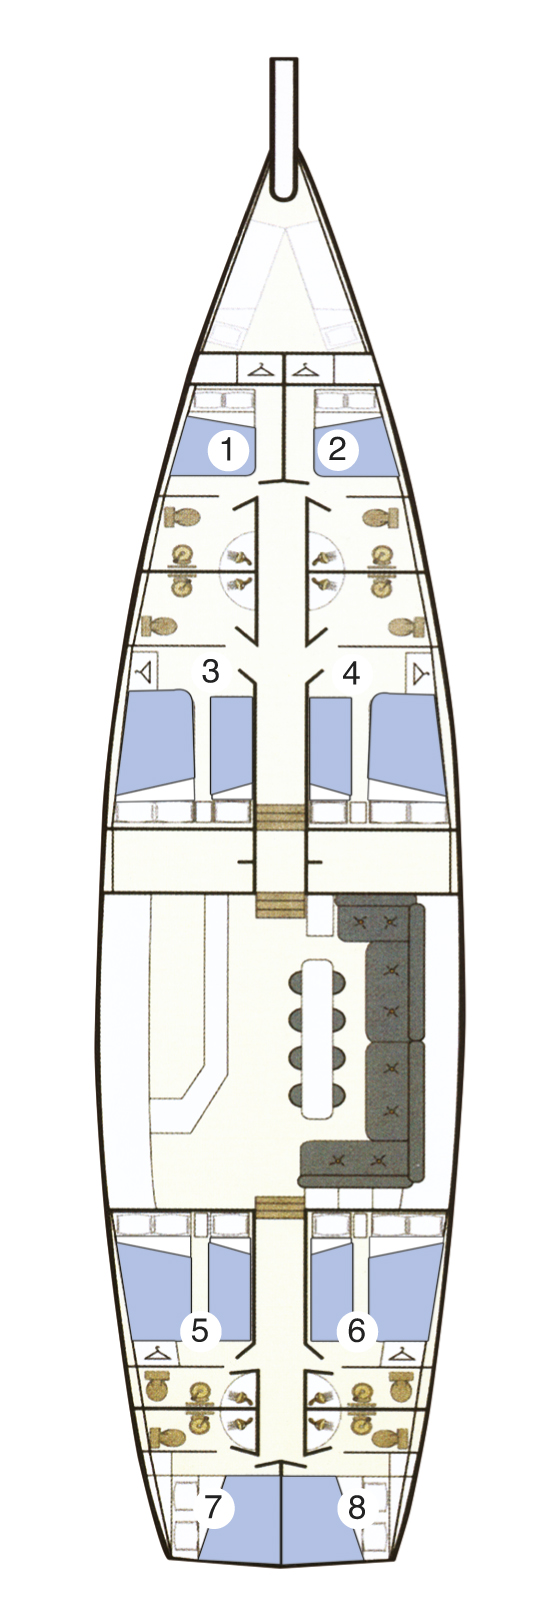 Blue-Cruise-layout.jpg